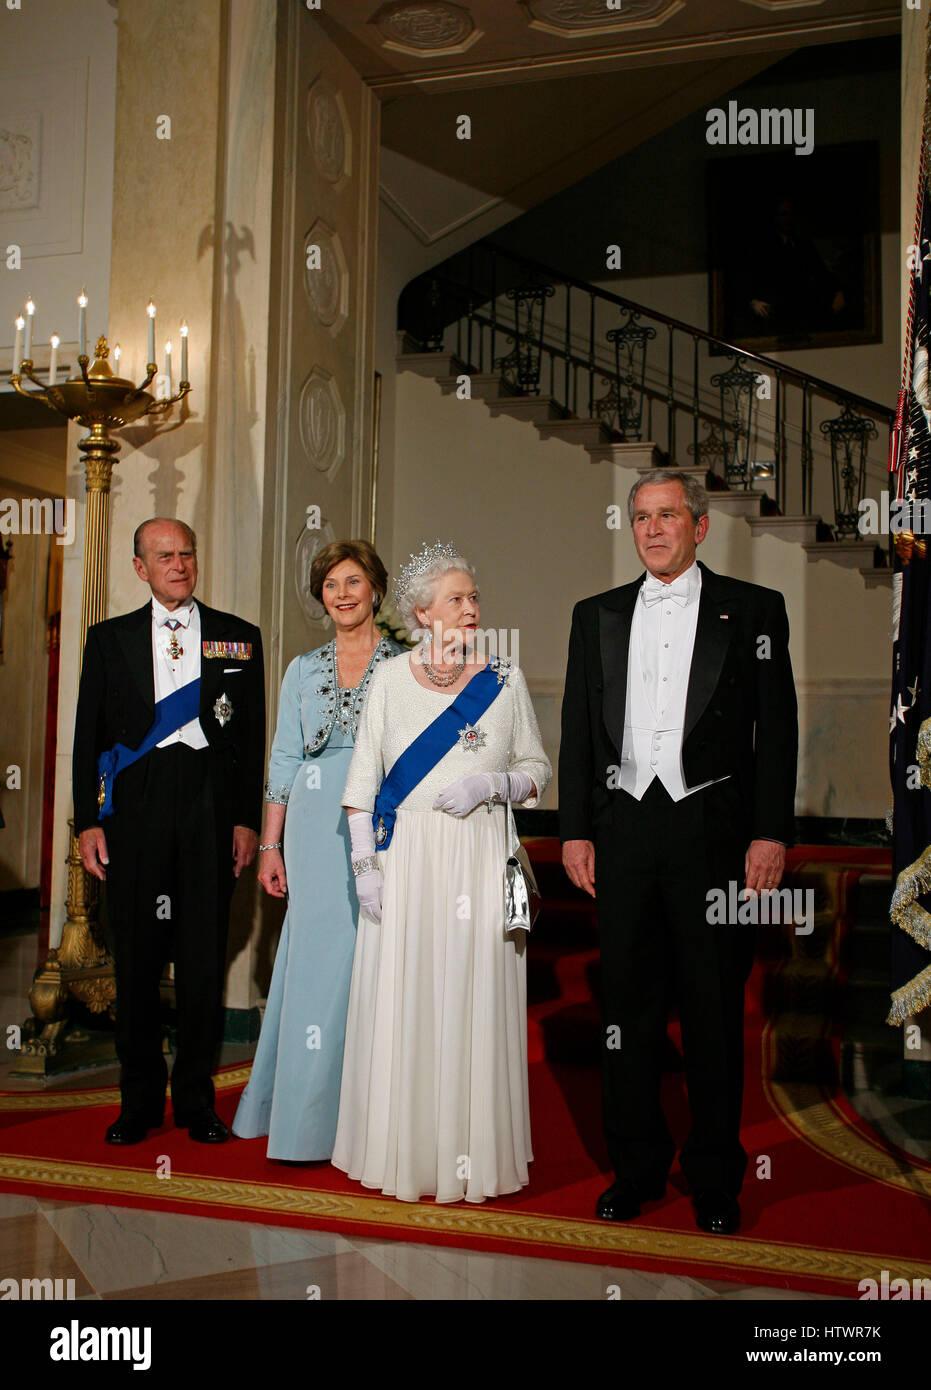 Queen Elizabeth Ii Of The United Kingdom And President George W Bush